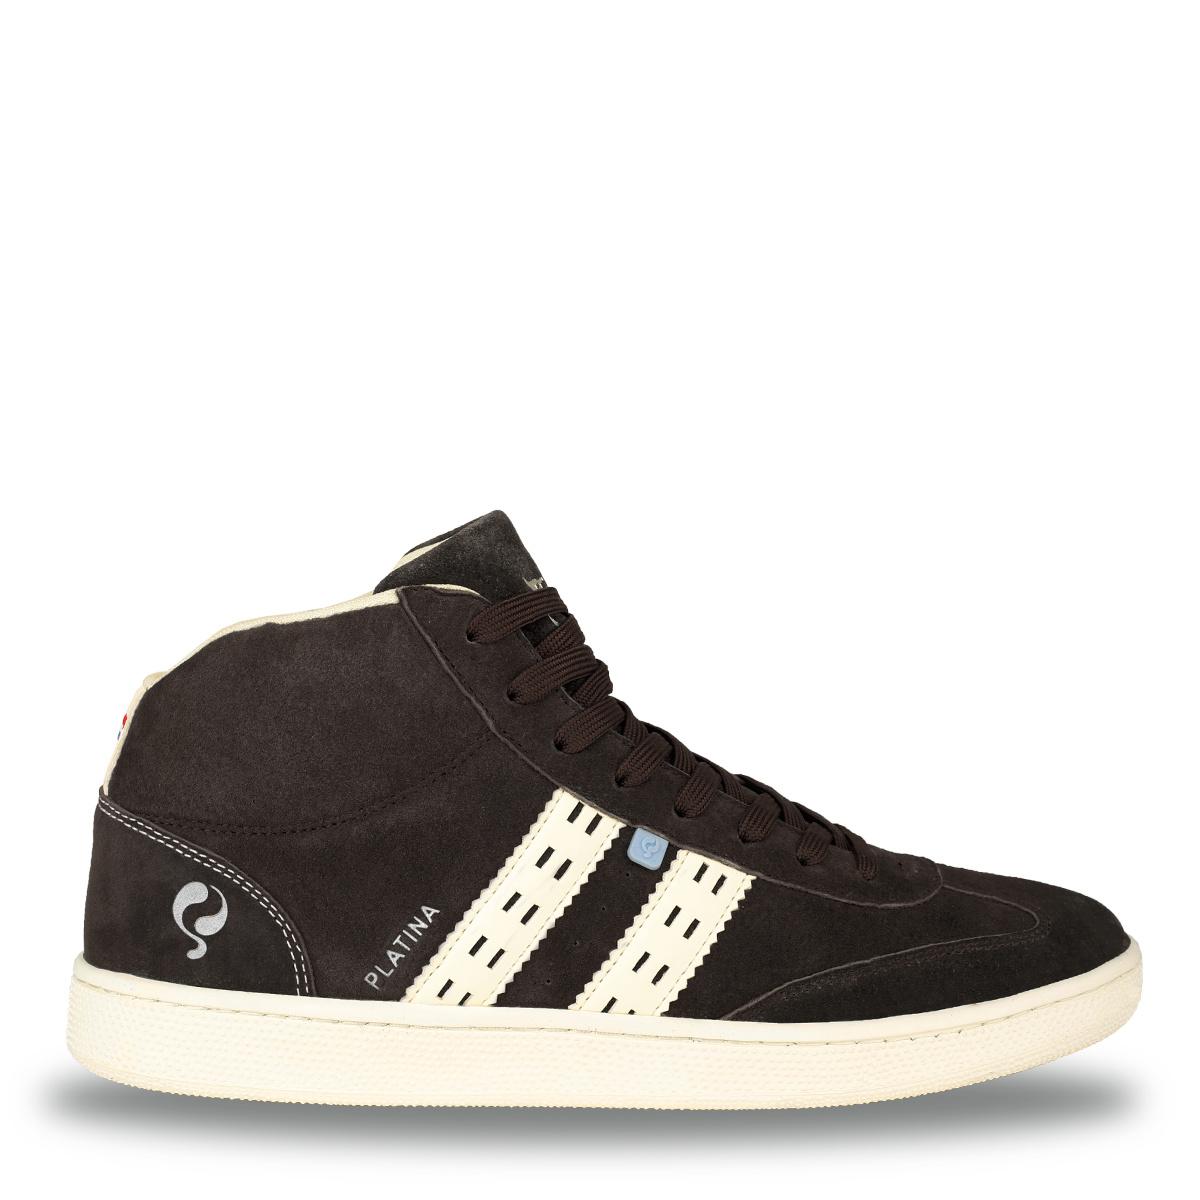 Heren Sneaker Platina - Donkerbruin/Crème